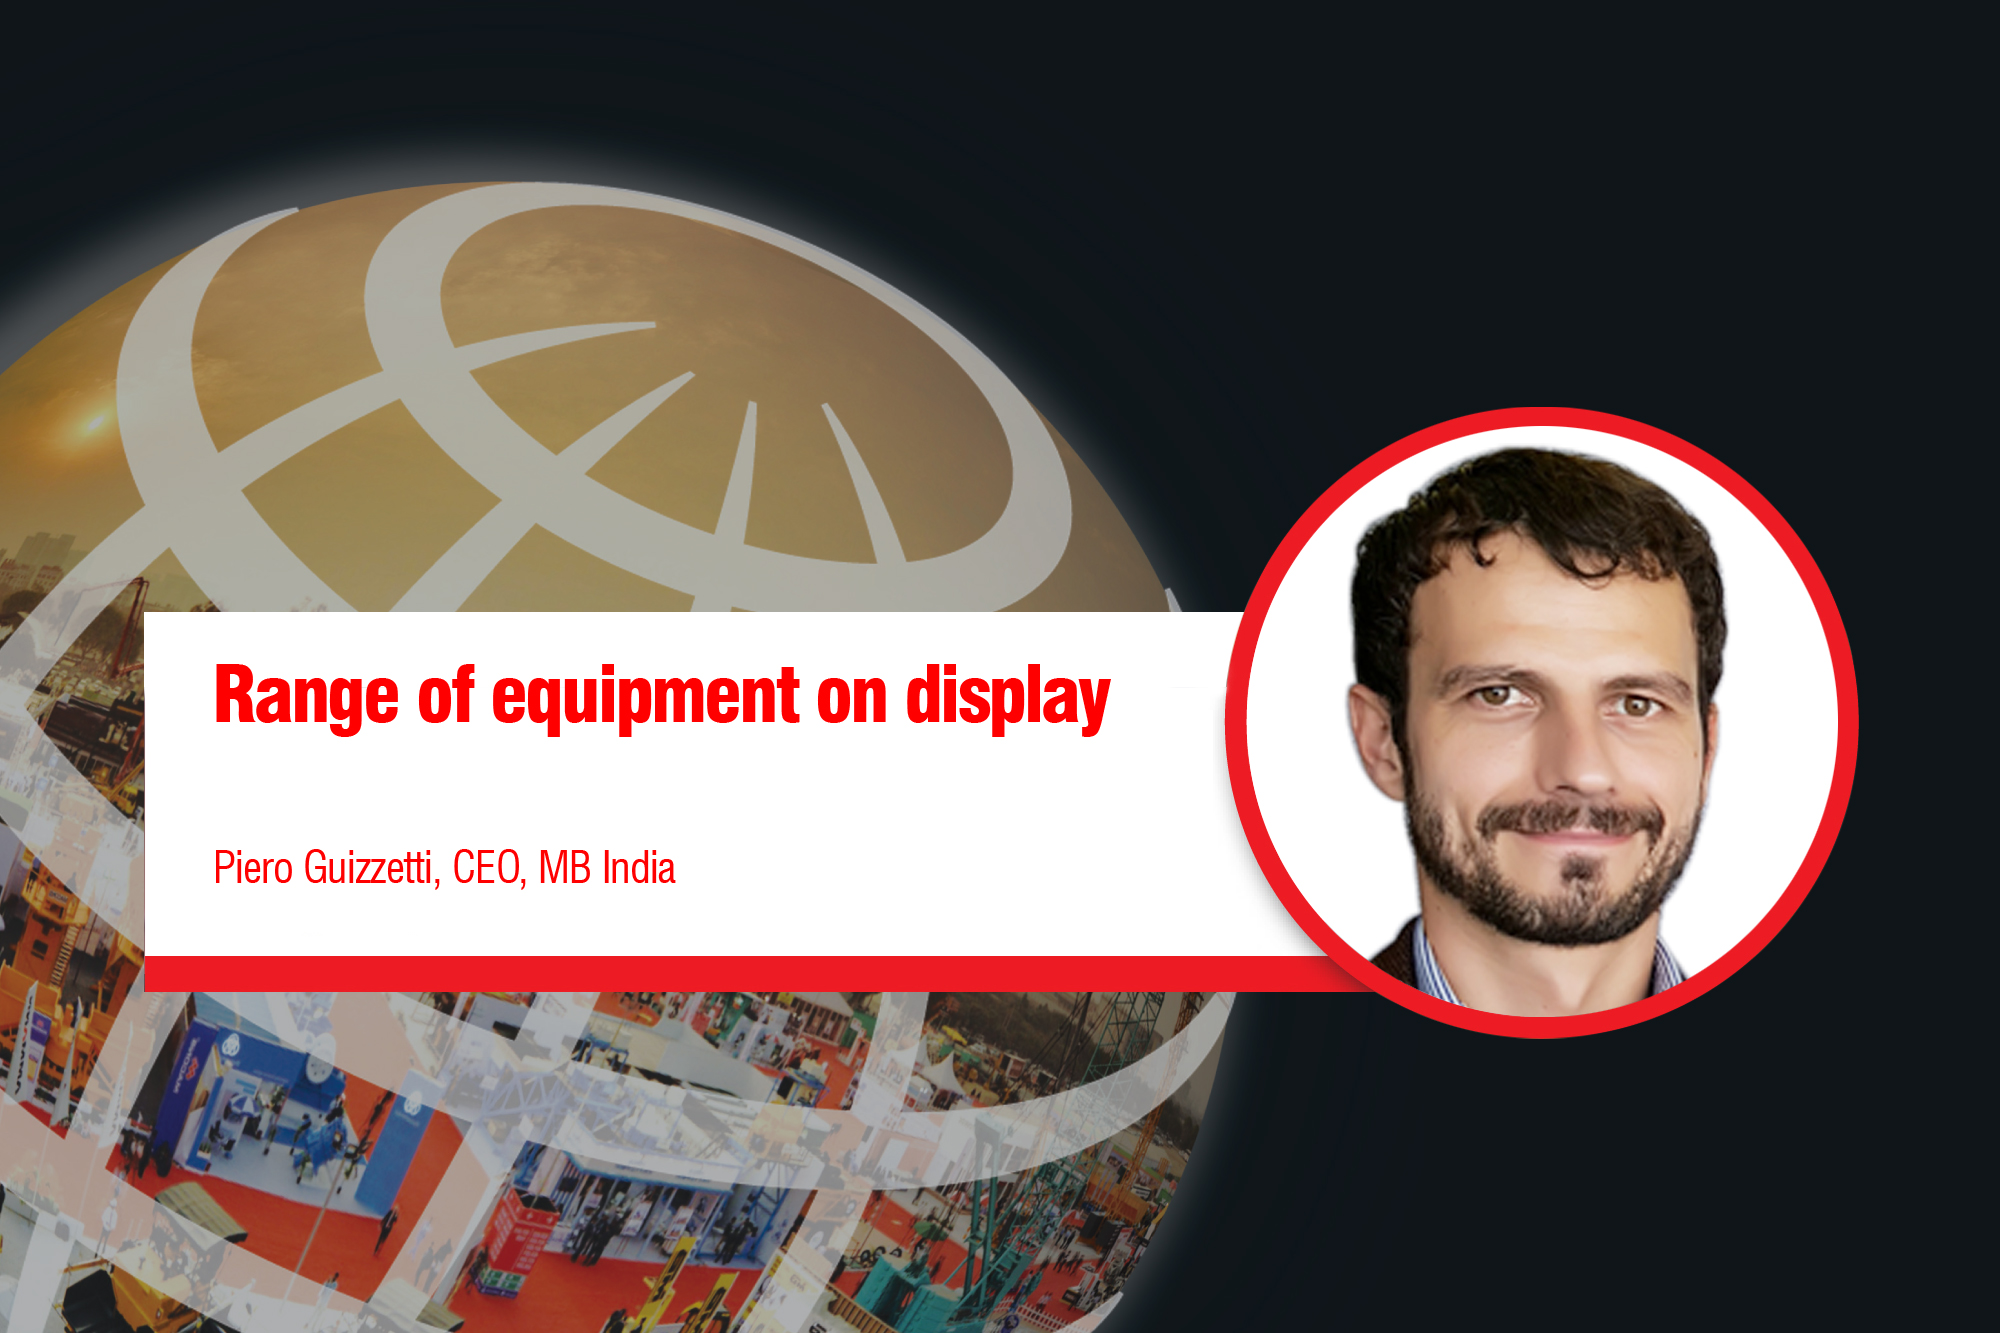 Range of equipment on display